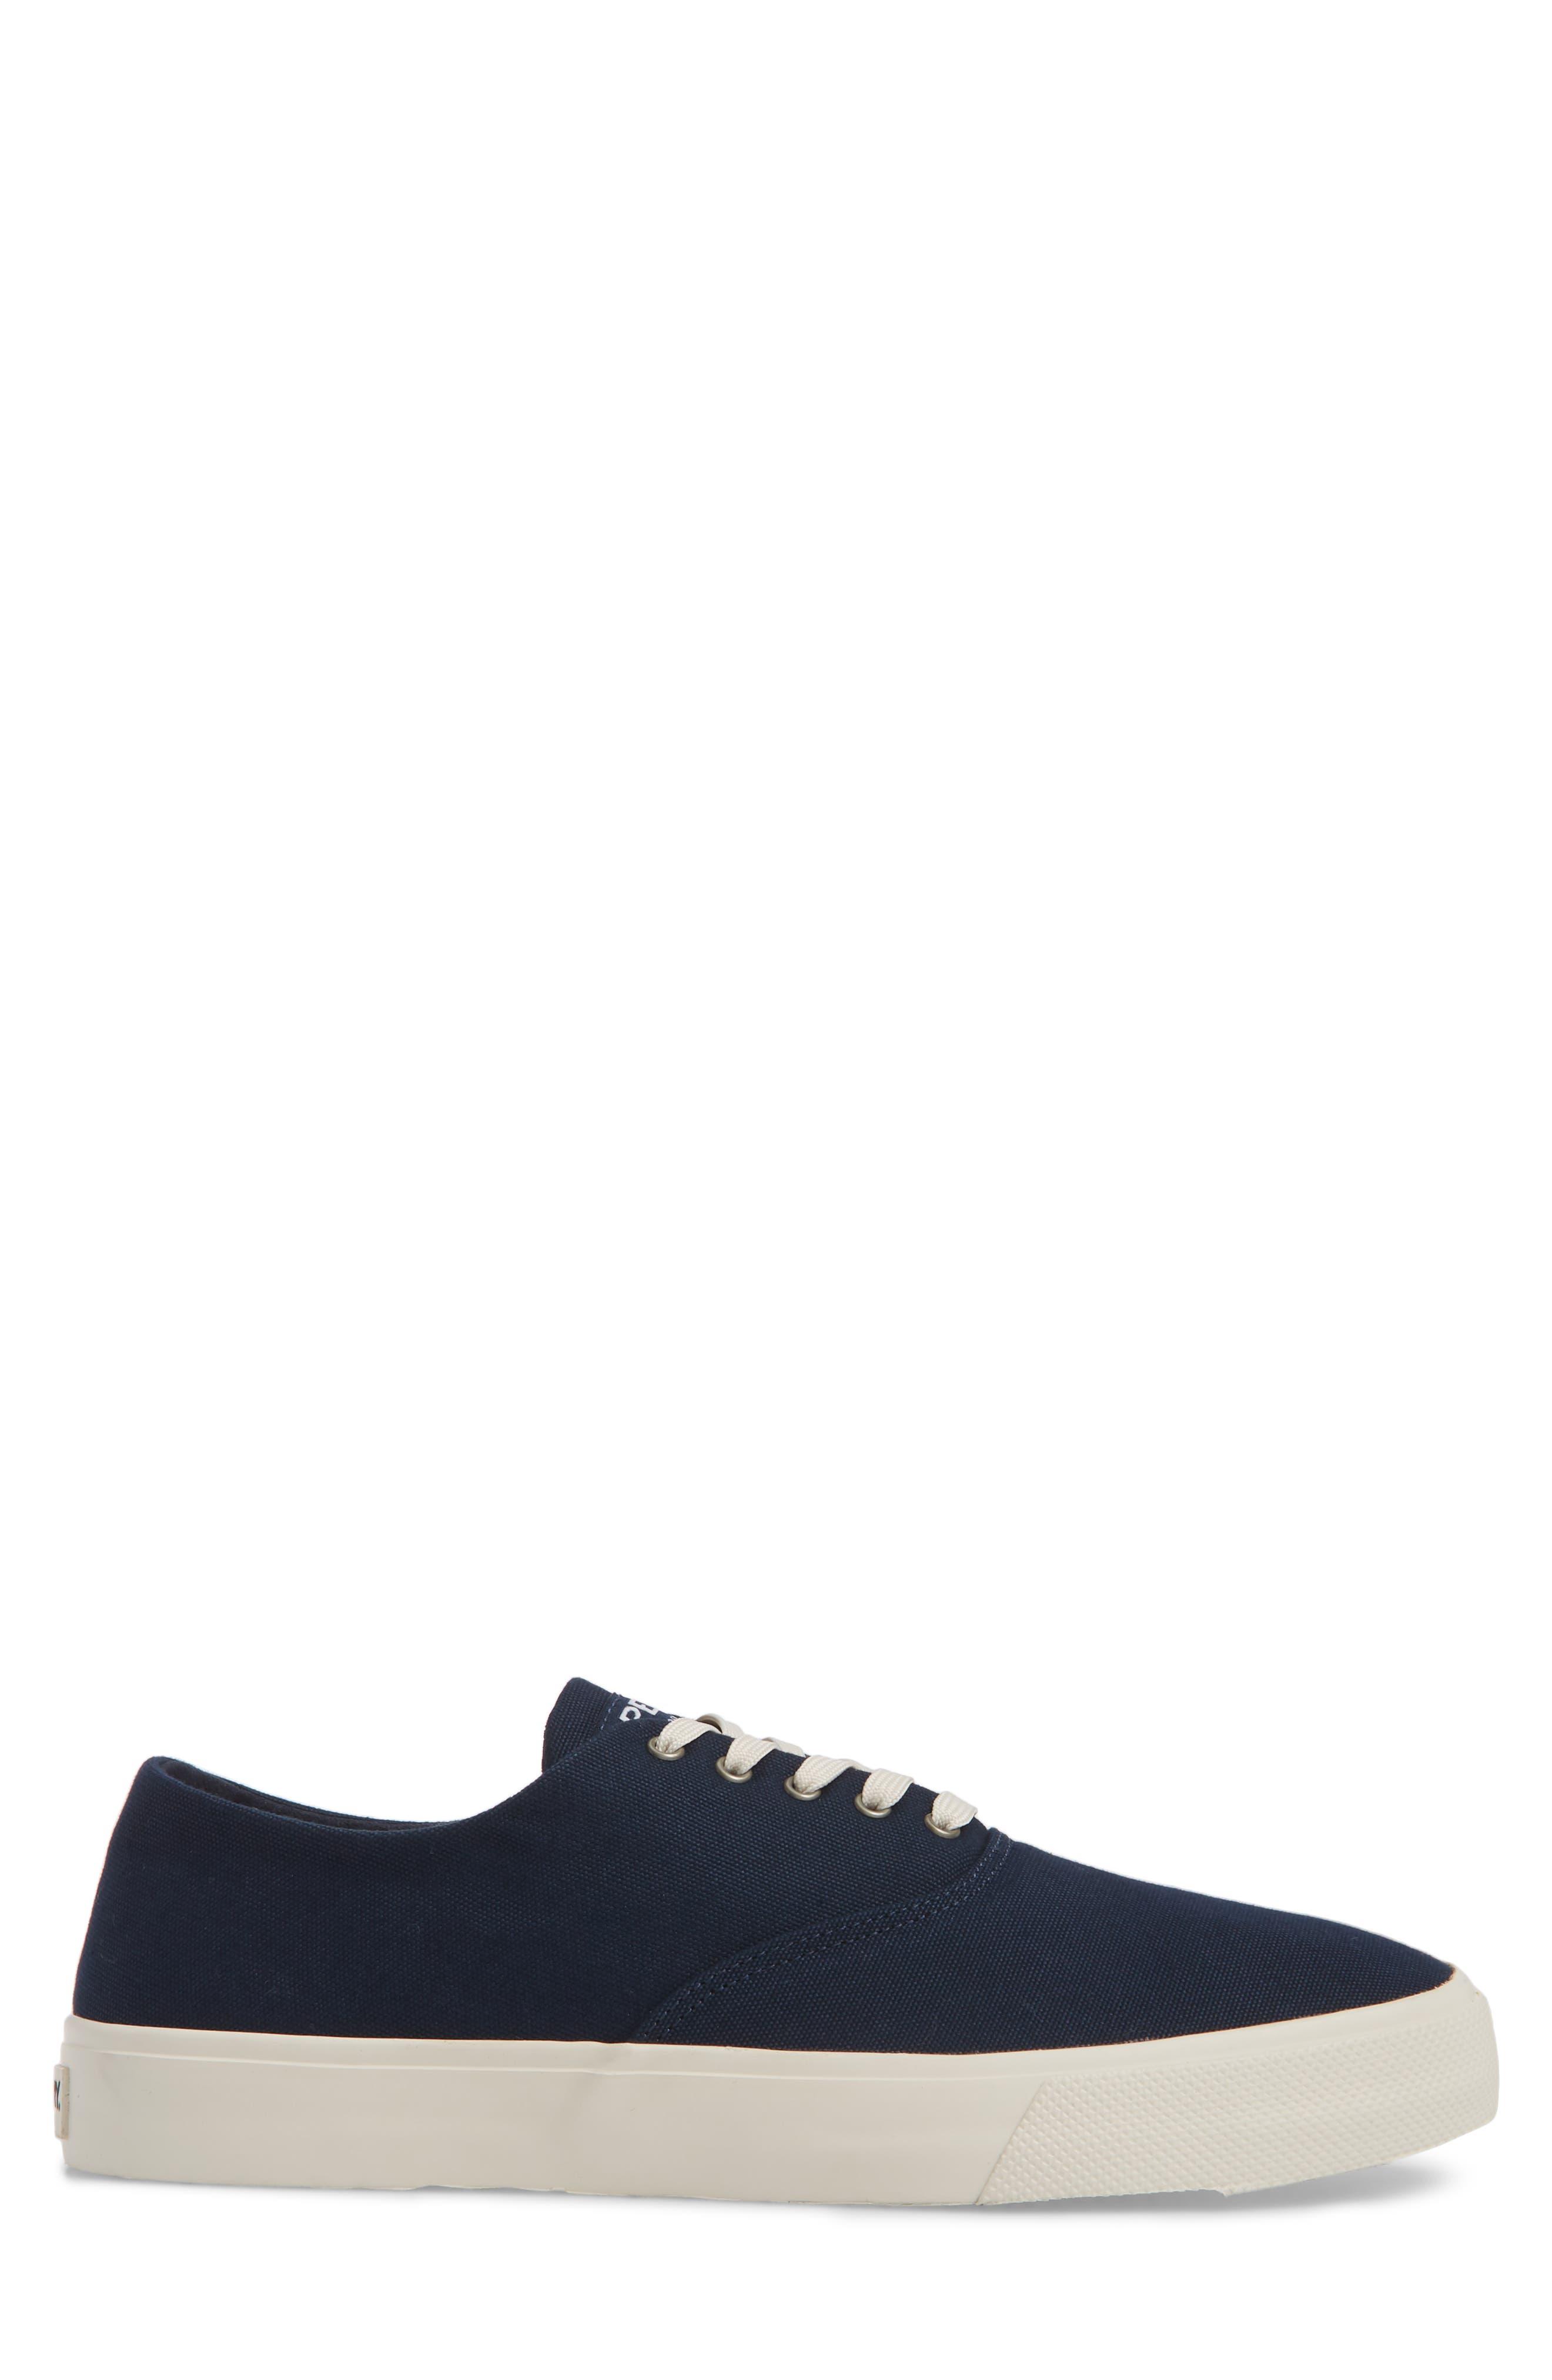 Captain's CVO Sneaker,                             Alternate thumbnail 3, color,                             Navy Fabric